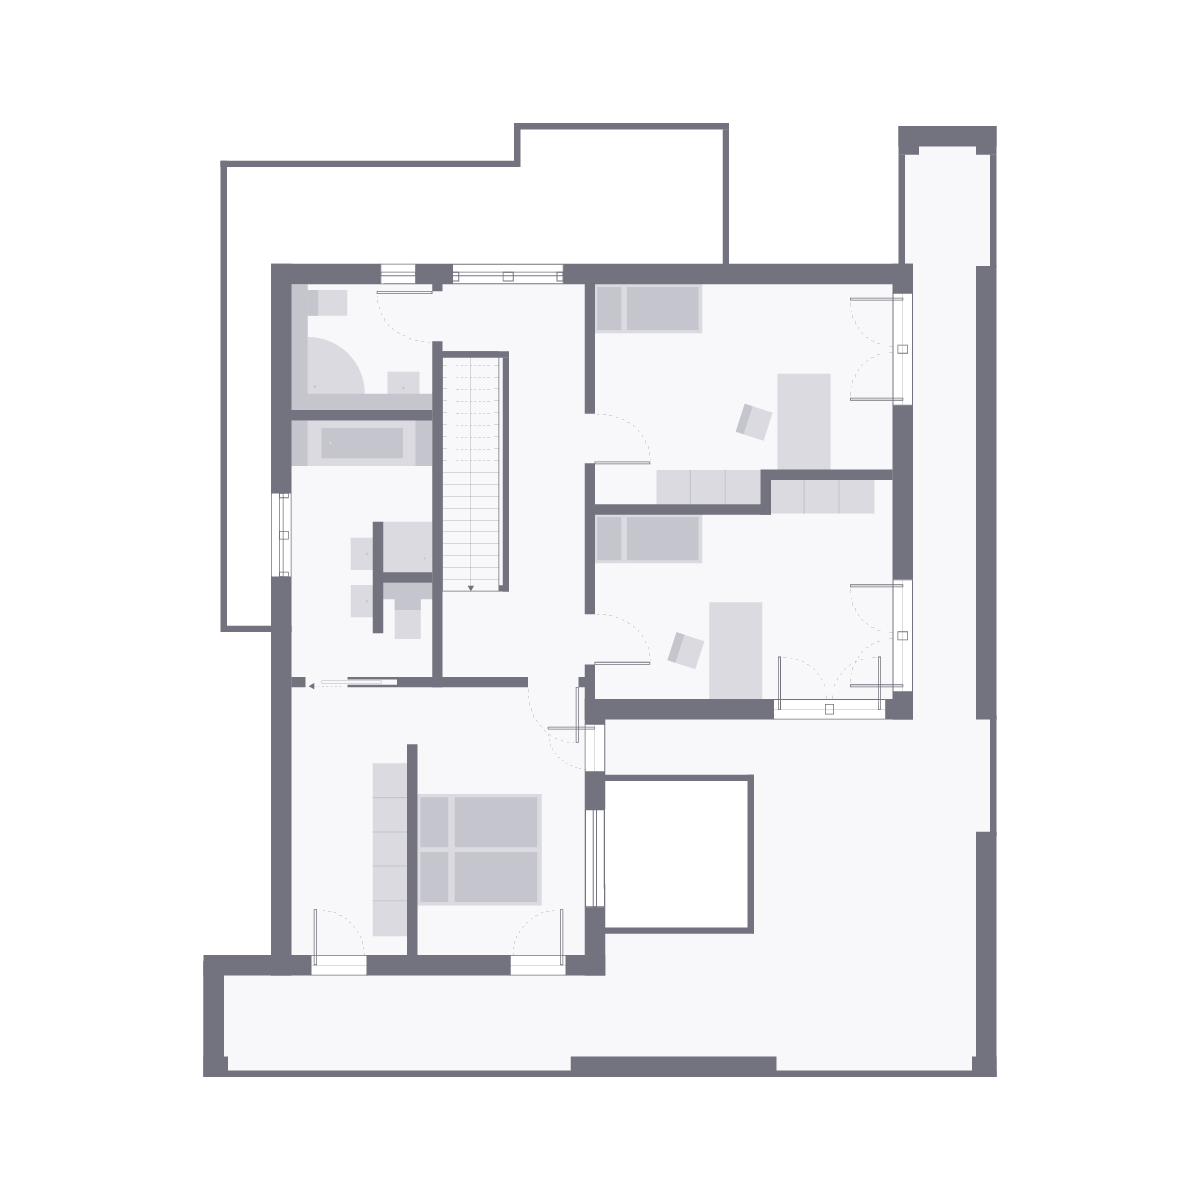 Musterhaus Wuppertal - Gebäudeplan